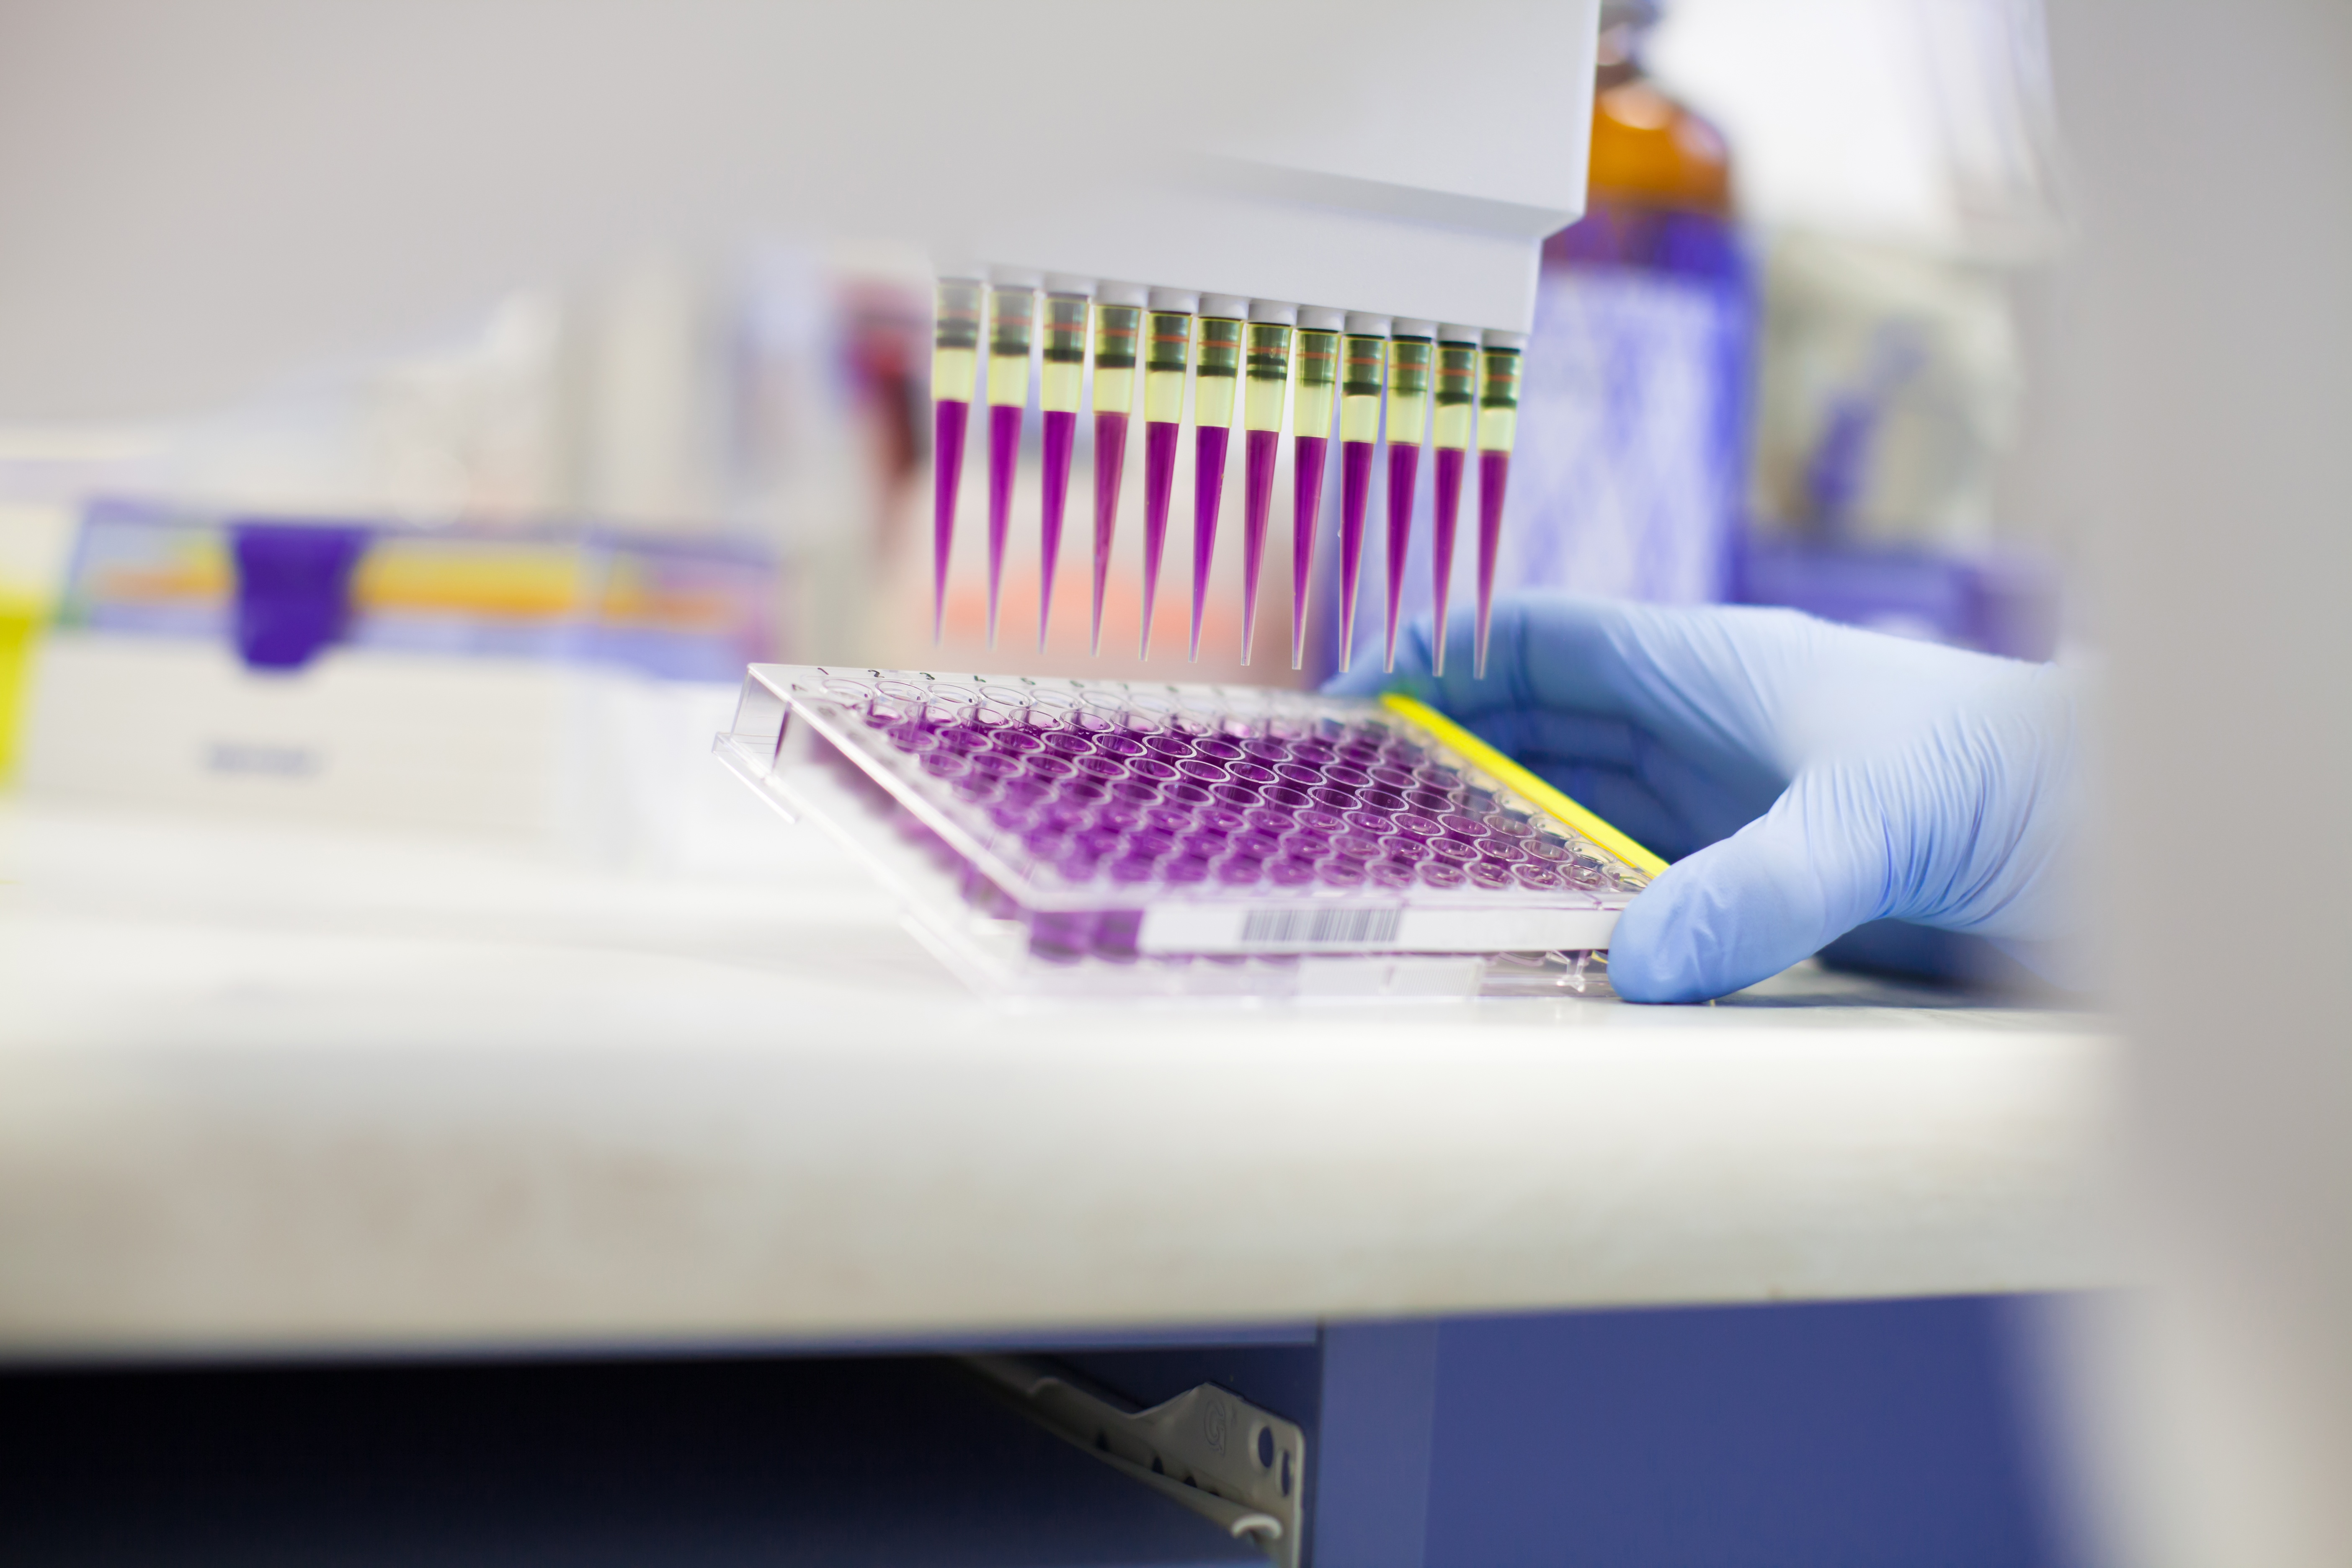 Assay-development-services-diagnostic-testing-validation-qualification-verification-clinical-trials